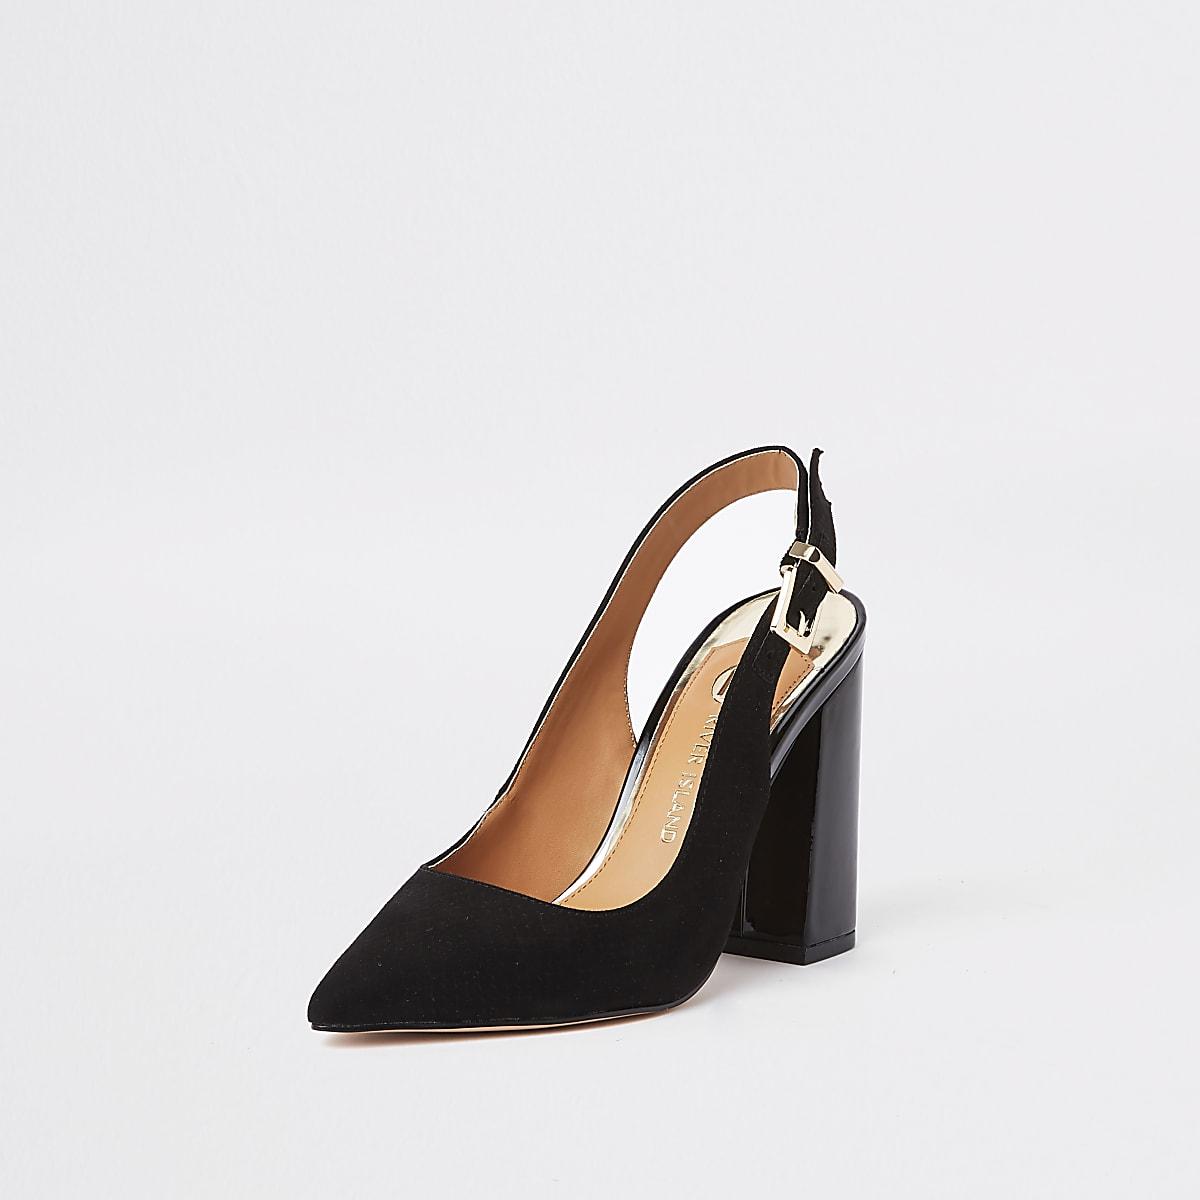 f94790f3797 Black block heel slingback court shoes - Shoes - Shoes   Boots - women